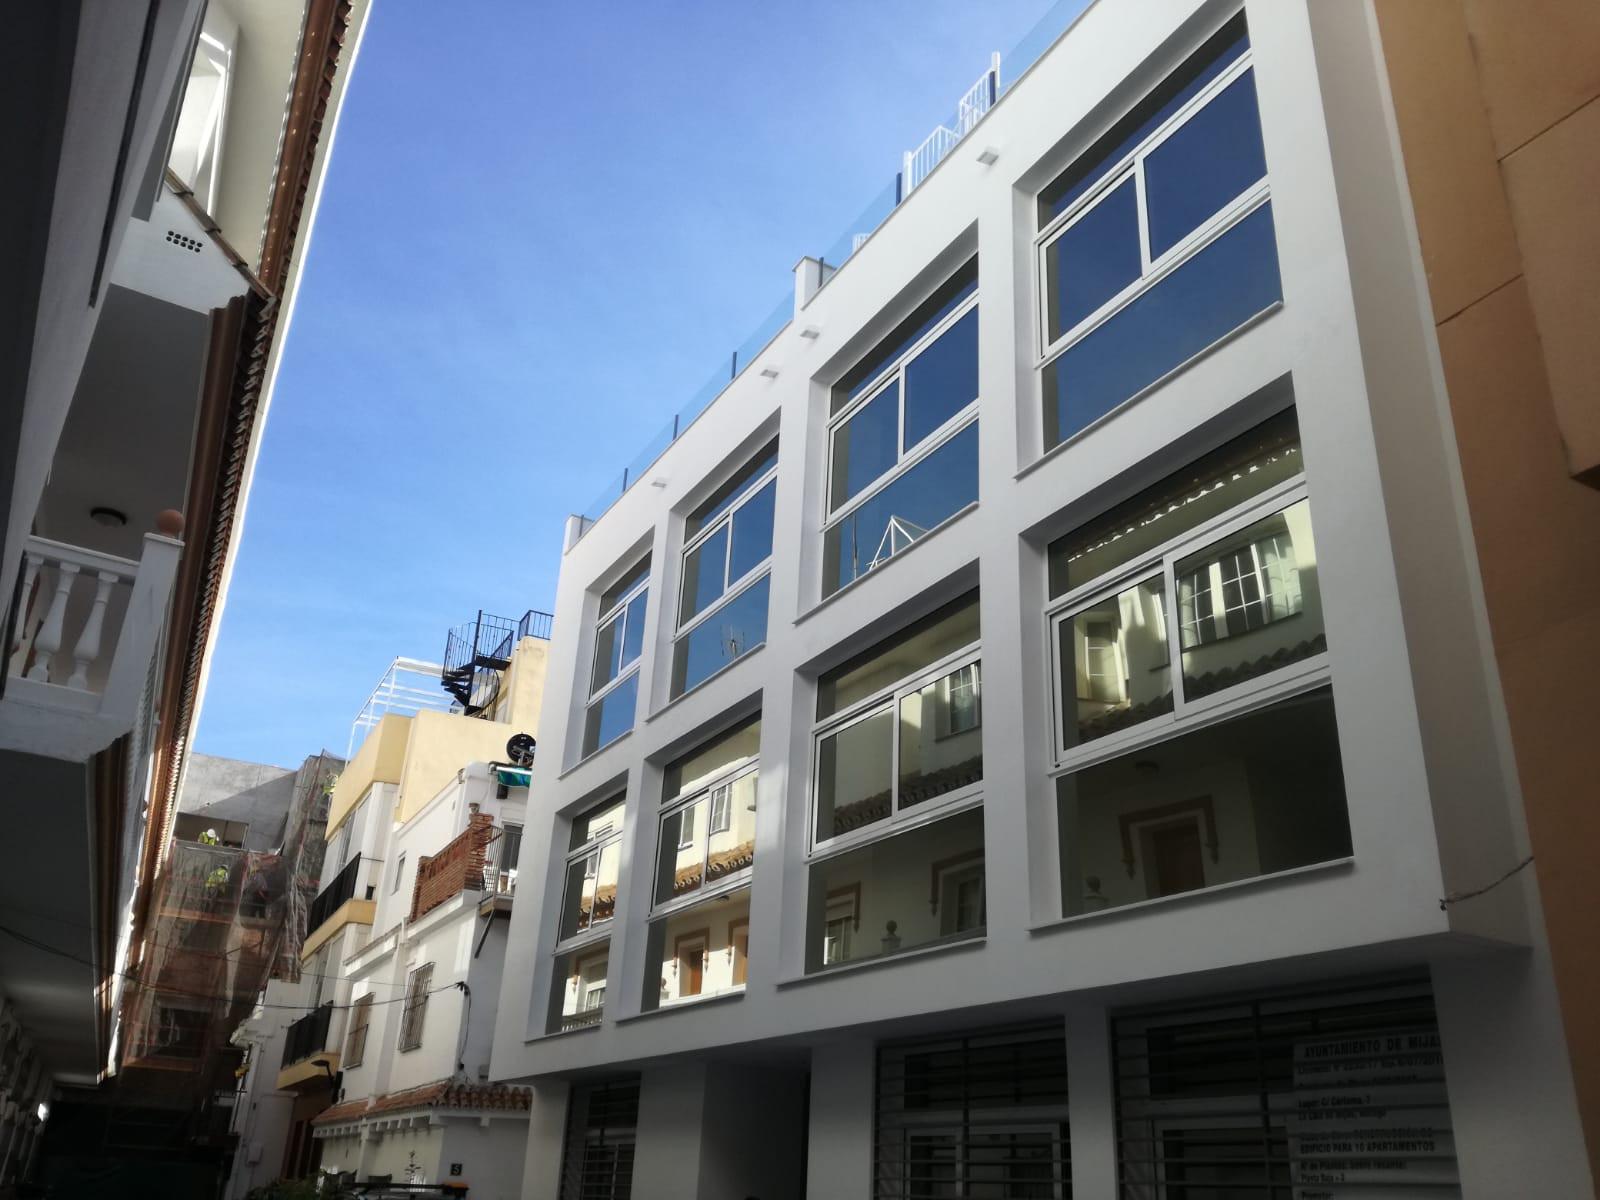 Second line beach contemporary apartments for sale in La Cala de Mijas - Mijas Costa